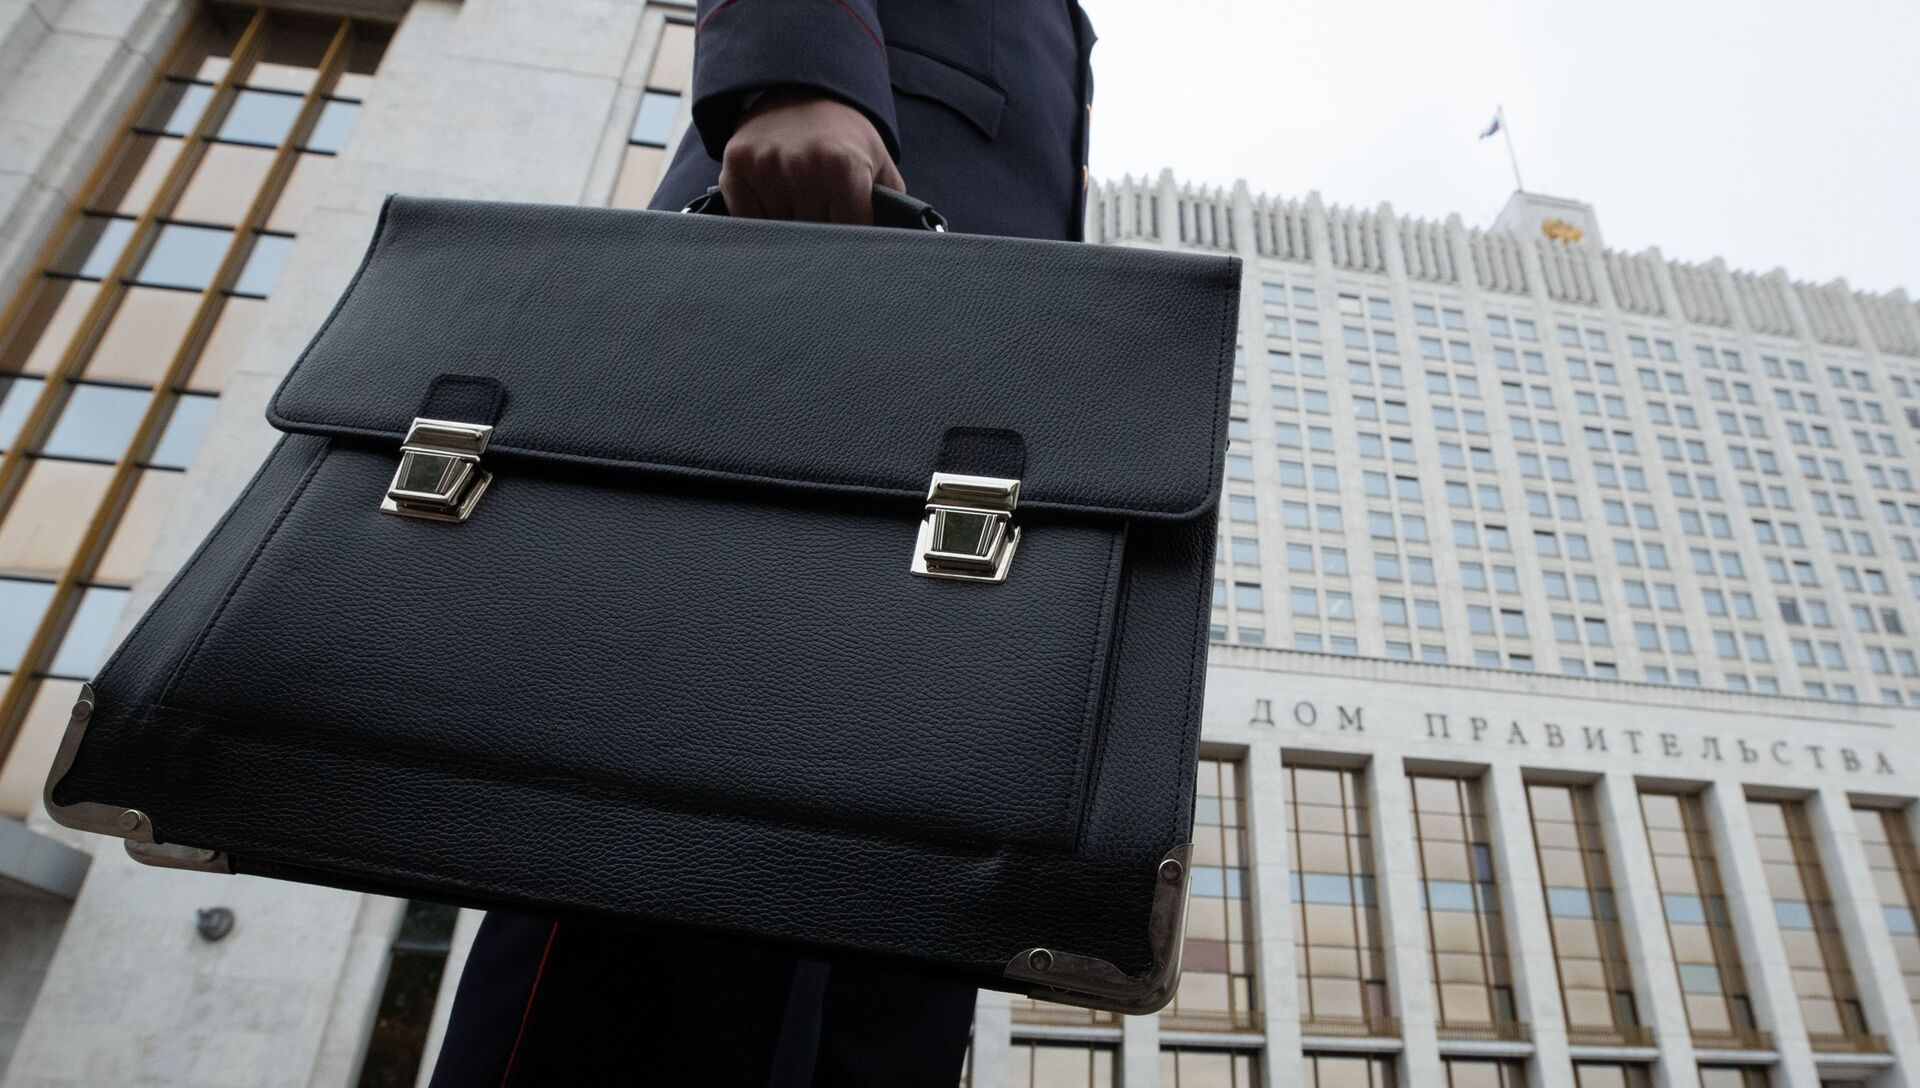 Внесение в Госдуму РФ проекта бюджета на 2020-2022 годы - РИА Новости, 1920, 16.10.2020